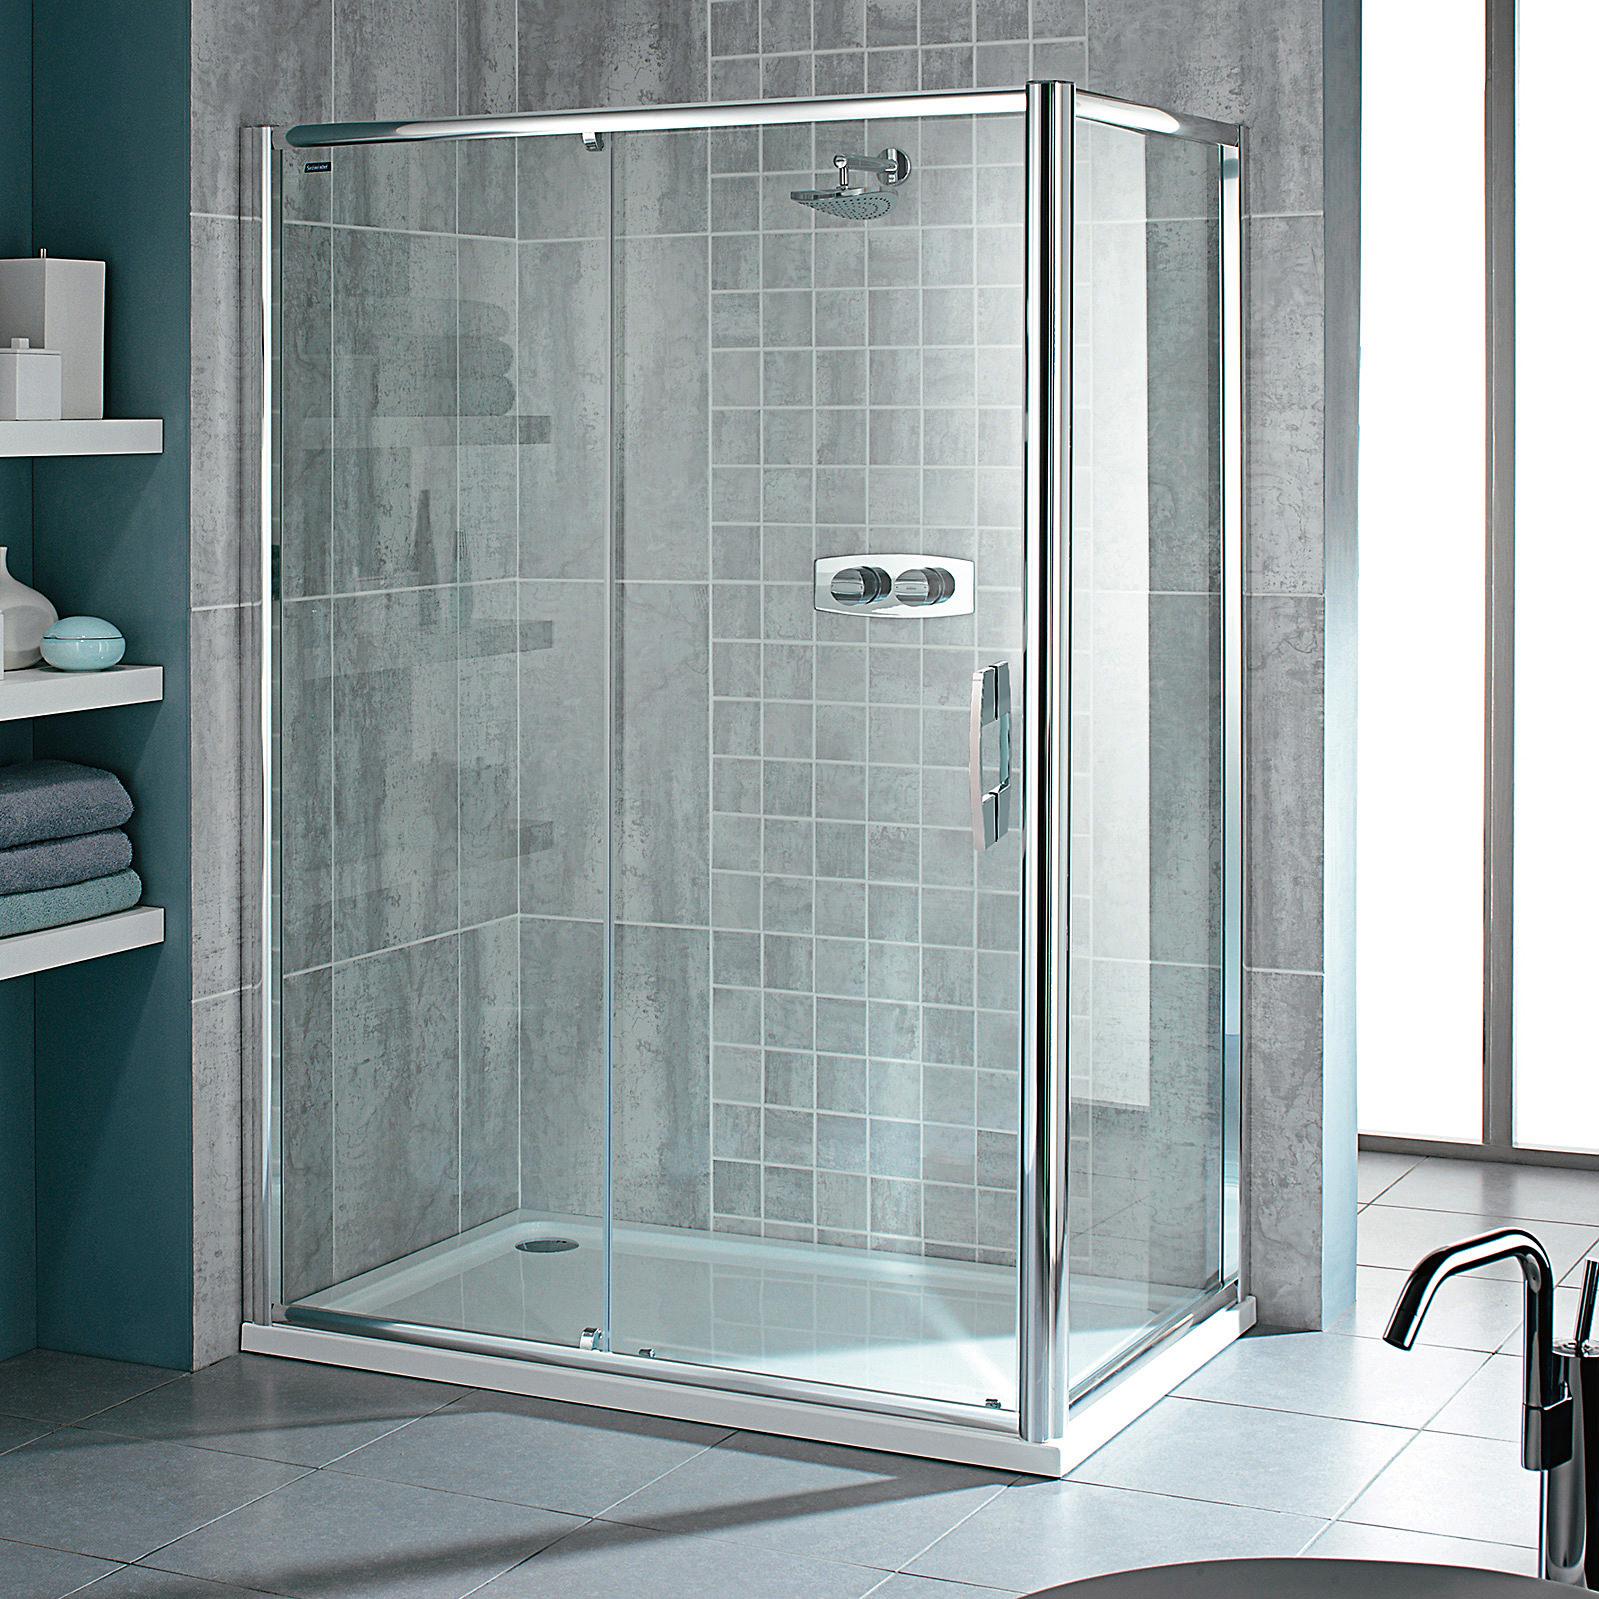 ... Showerlux Shower Doors Showerlux Shower Doors Showerlux Shower Doors Showerlux ... & Showerlux Shower Doors - Showerlux Legacy Pivot Shower Door 1000mm ...